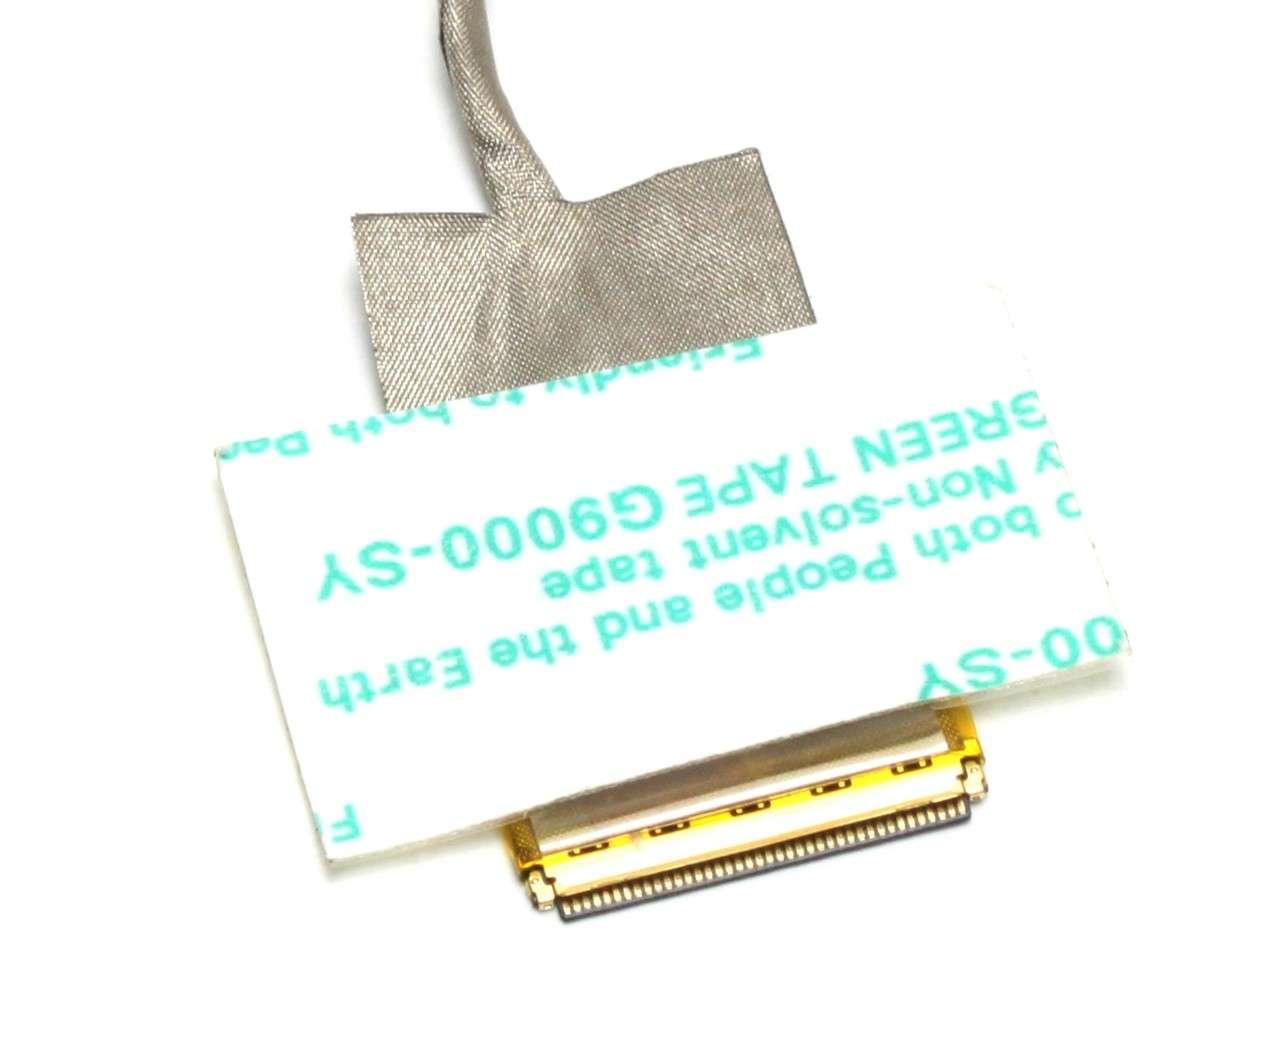 Cablu video LVDS Asus 1422 01VY0AS fara touchscreen imagine powerlaptop.ro 2021